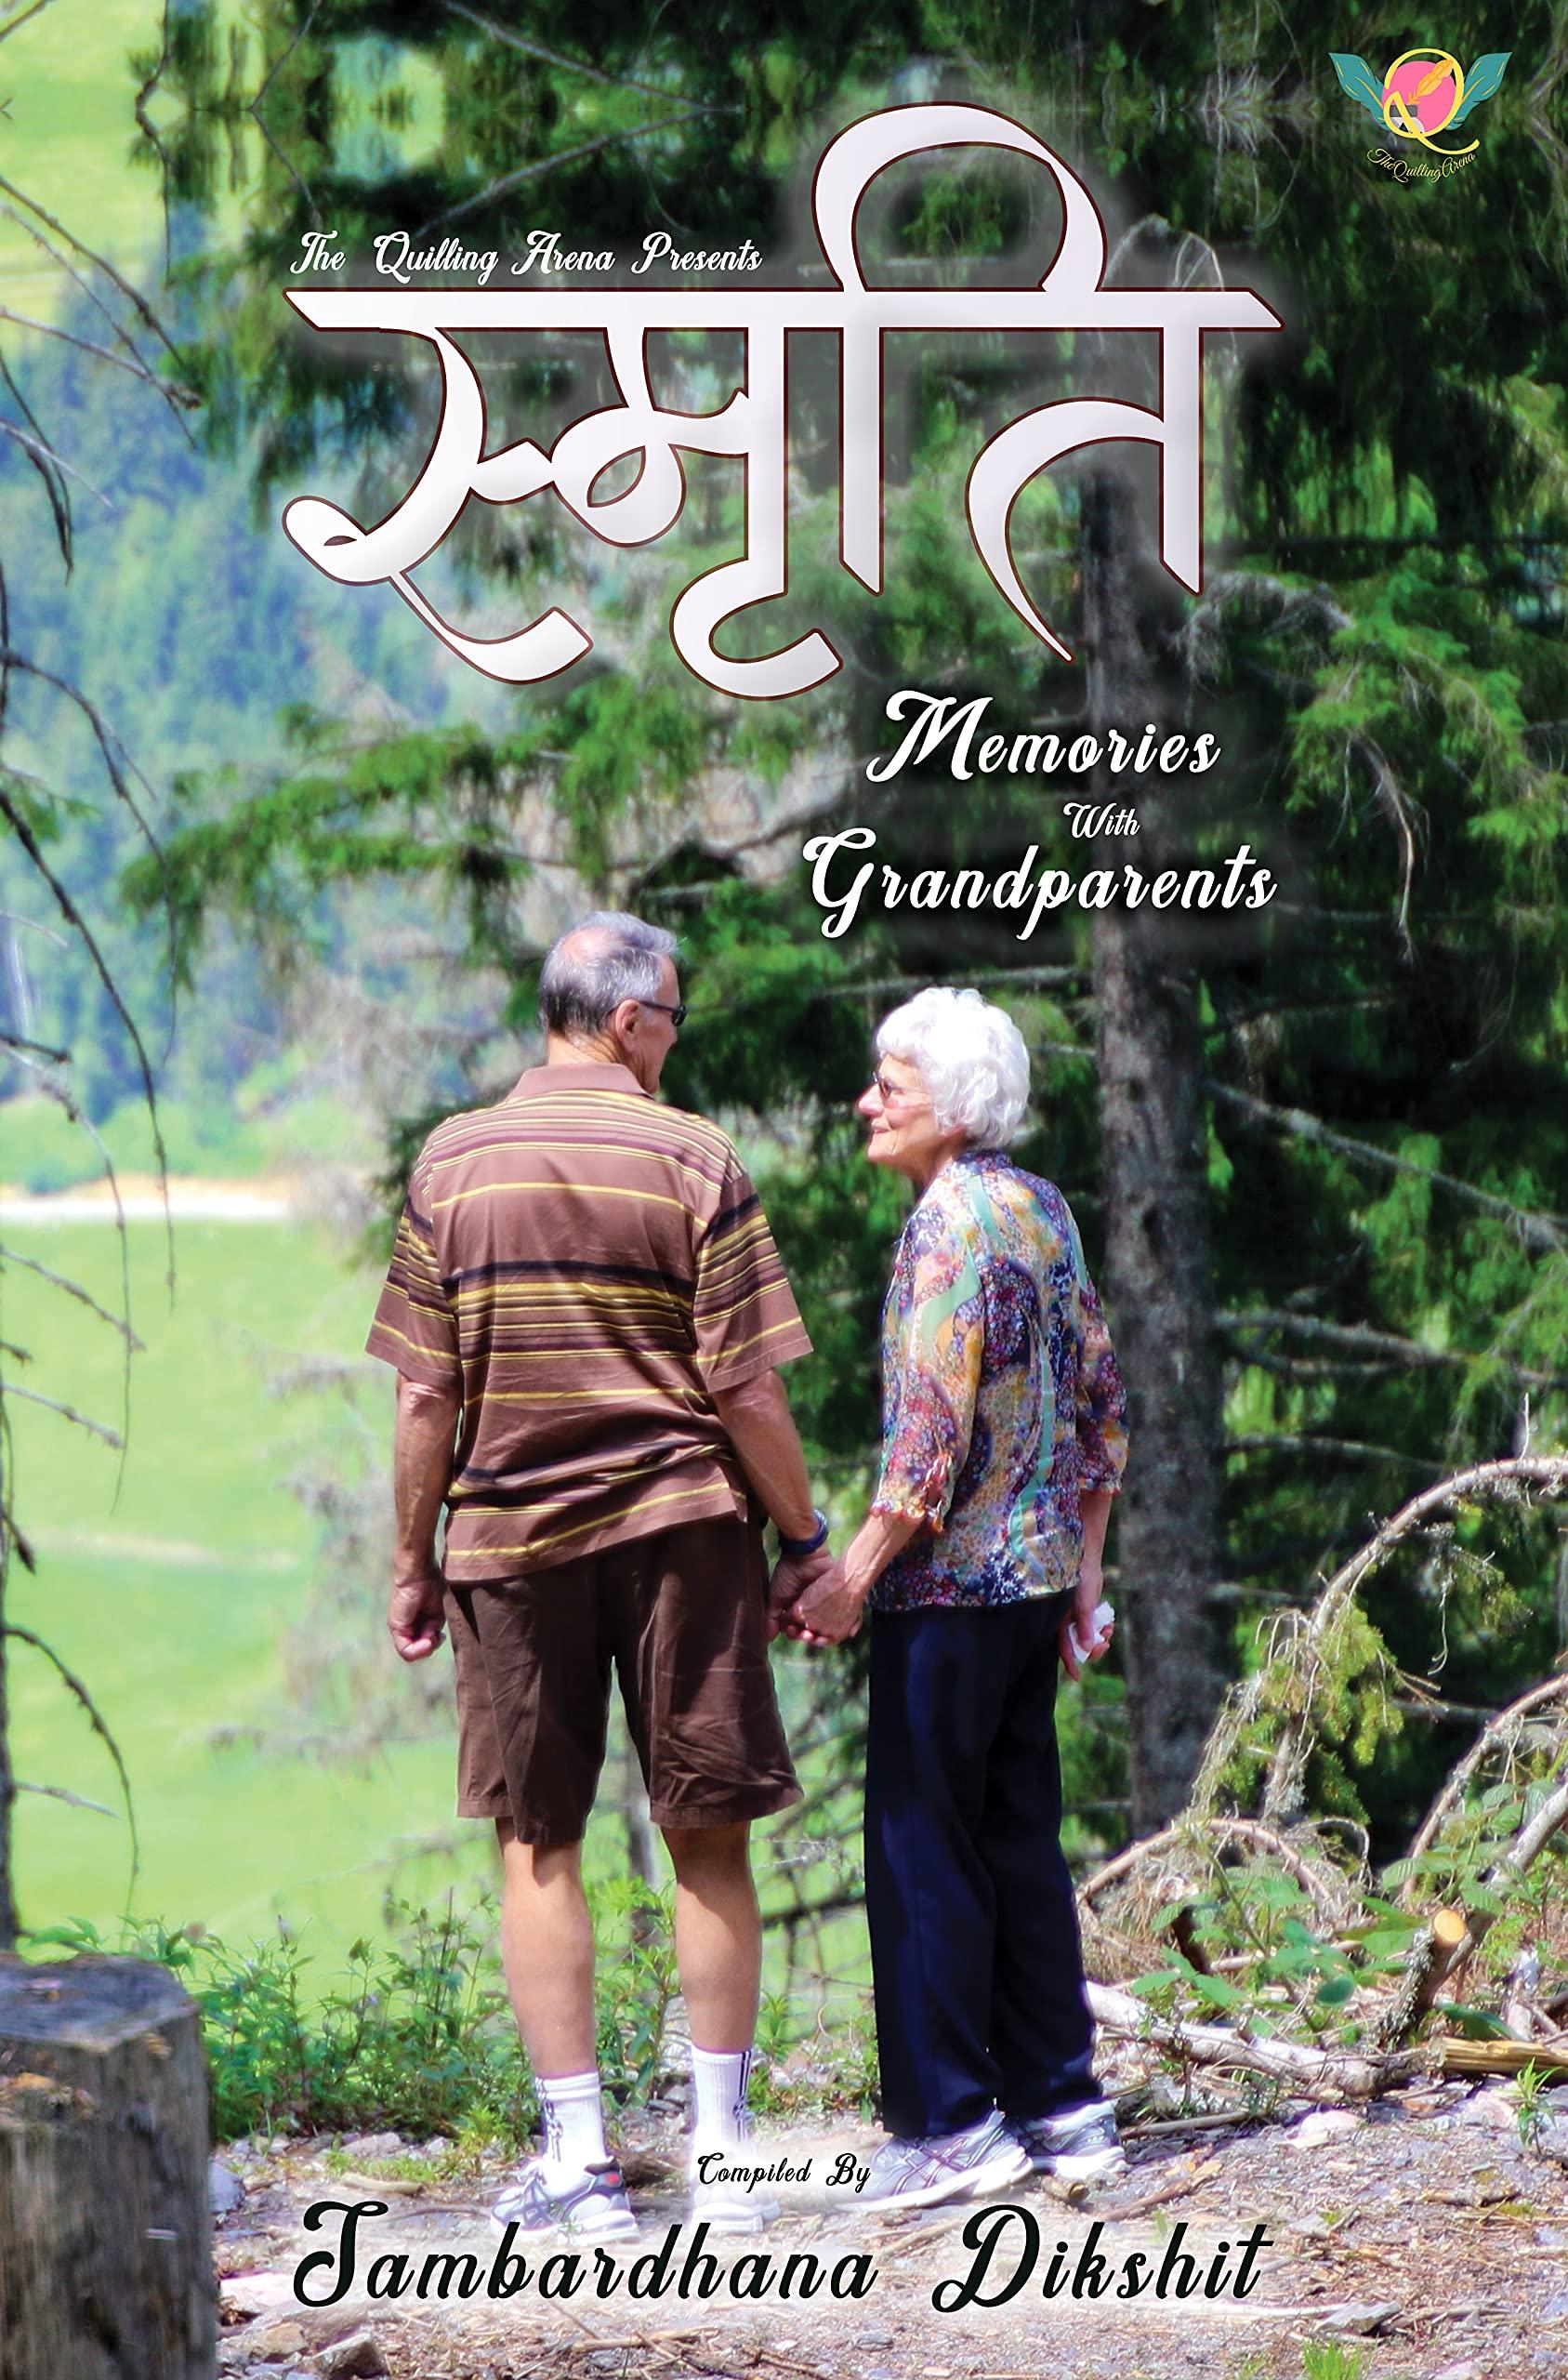 Smriti-MEMORIES WITH GRANDPARENTS